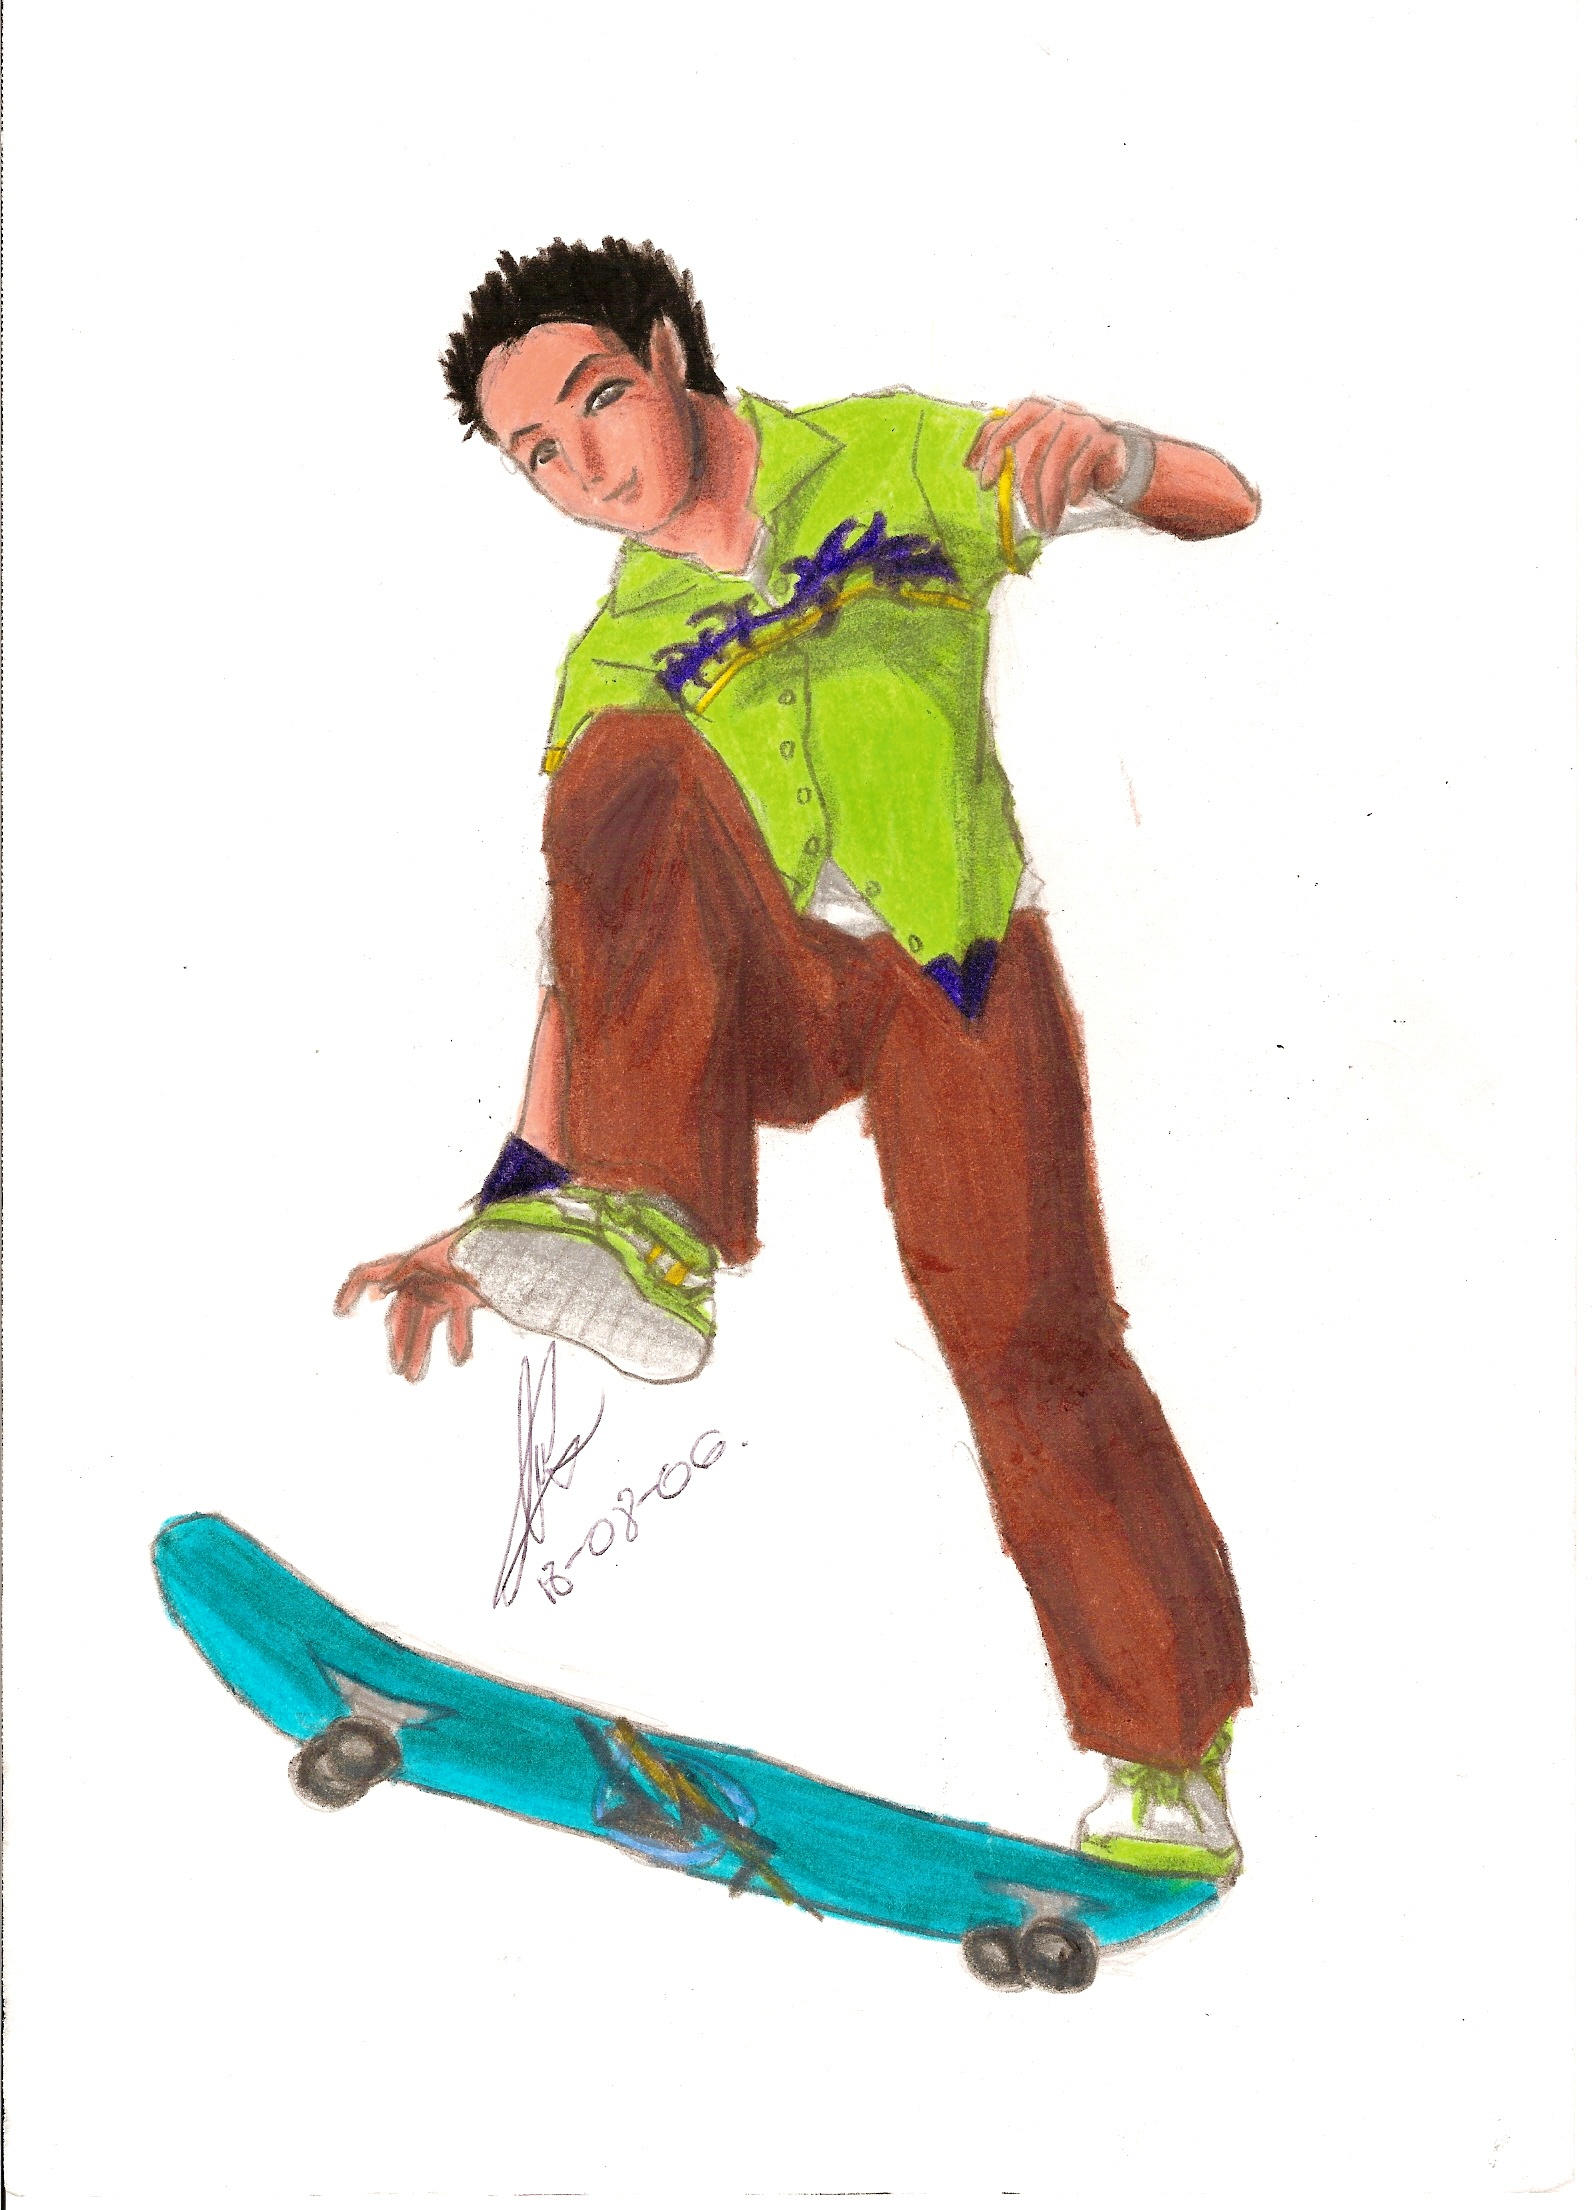 Skate_-_Japanese_-_Boy by yukax-poison